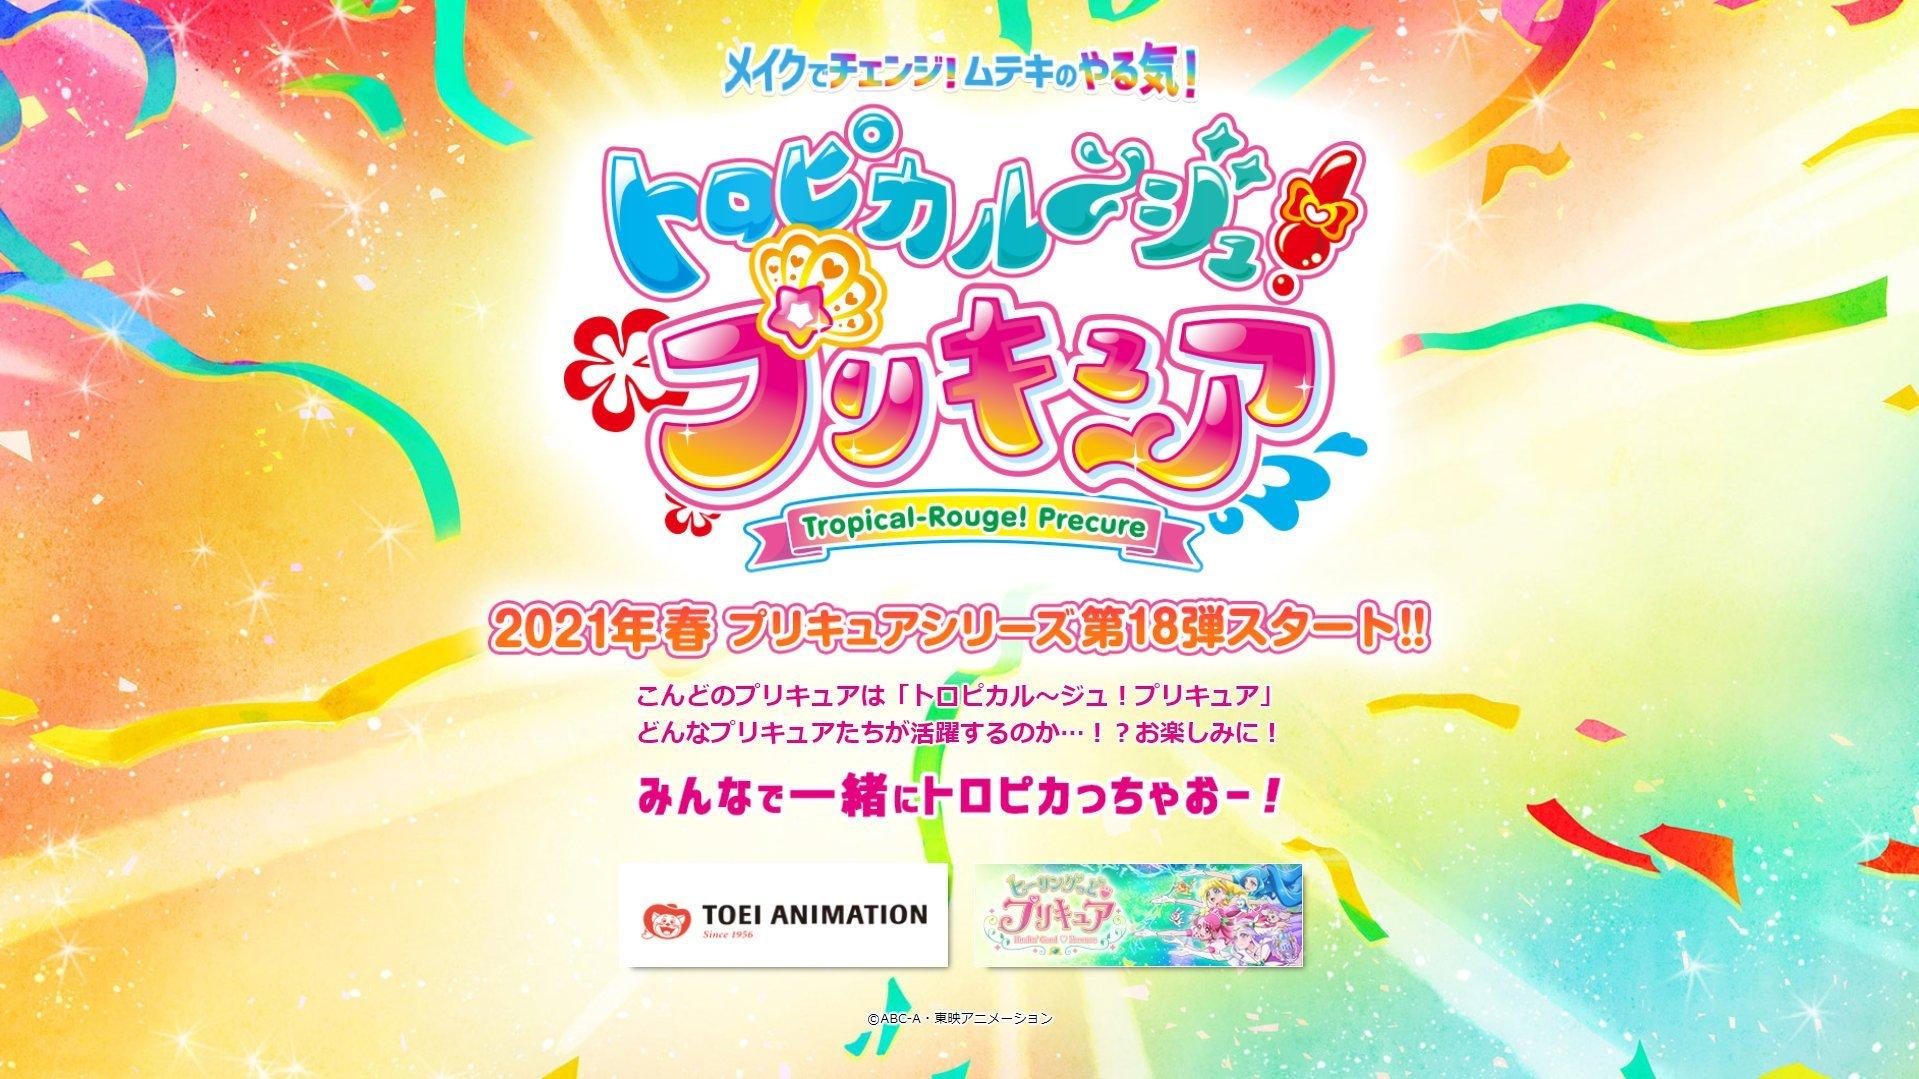 Toei Animation anuncia 'Tropical-Rouge! Precure' para 2021